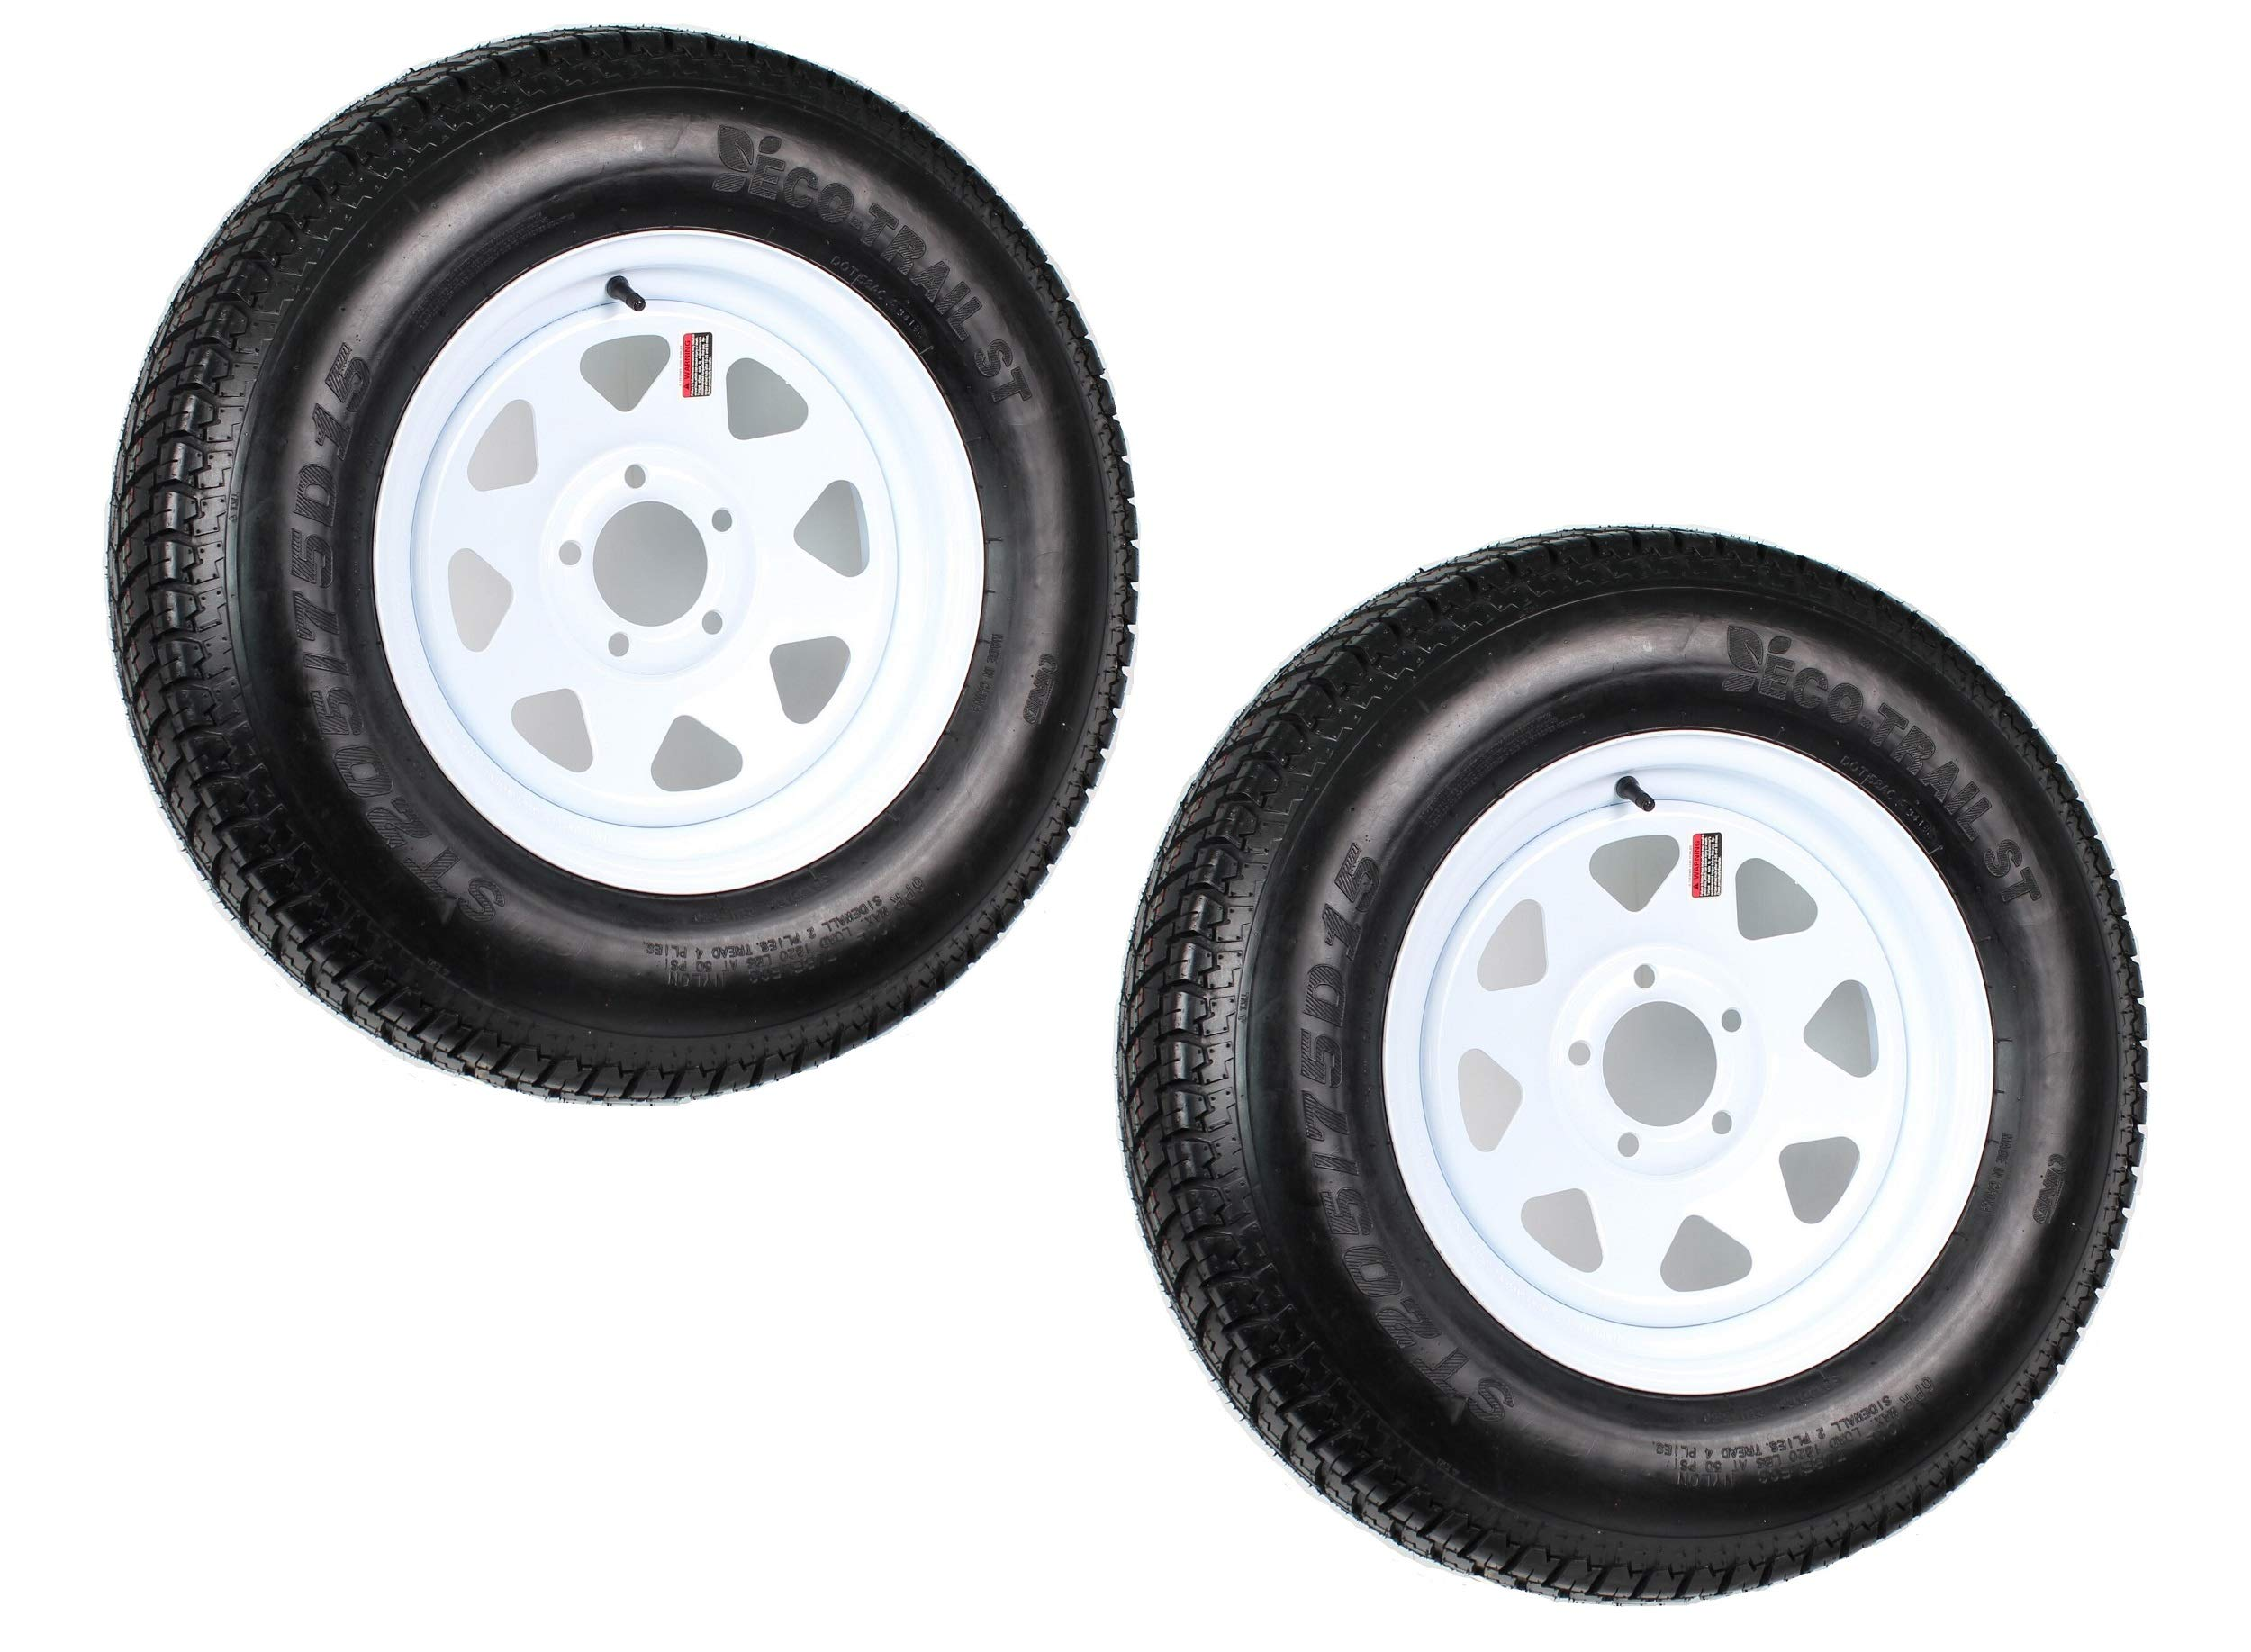 2pcs Trailer Tires & Rims ST205/75D15 F78-15 205/75-15 15'' 5 Lug 4.5'' Wheel White Spoke